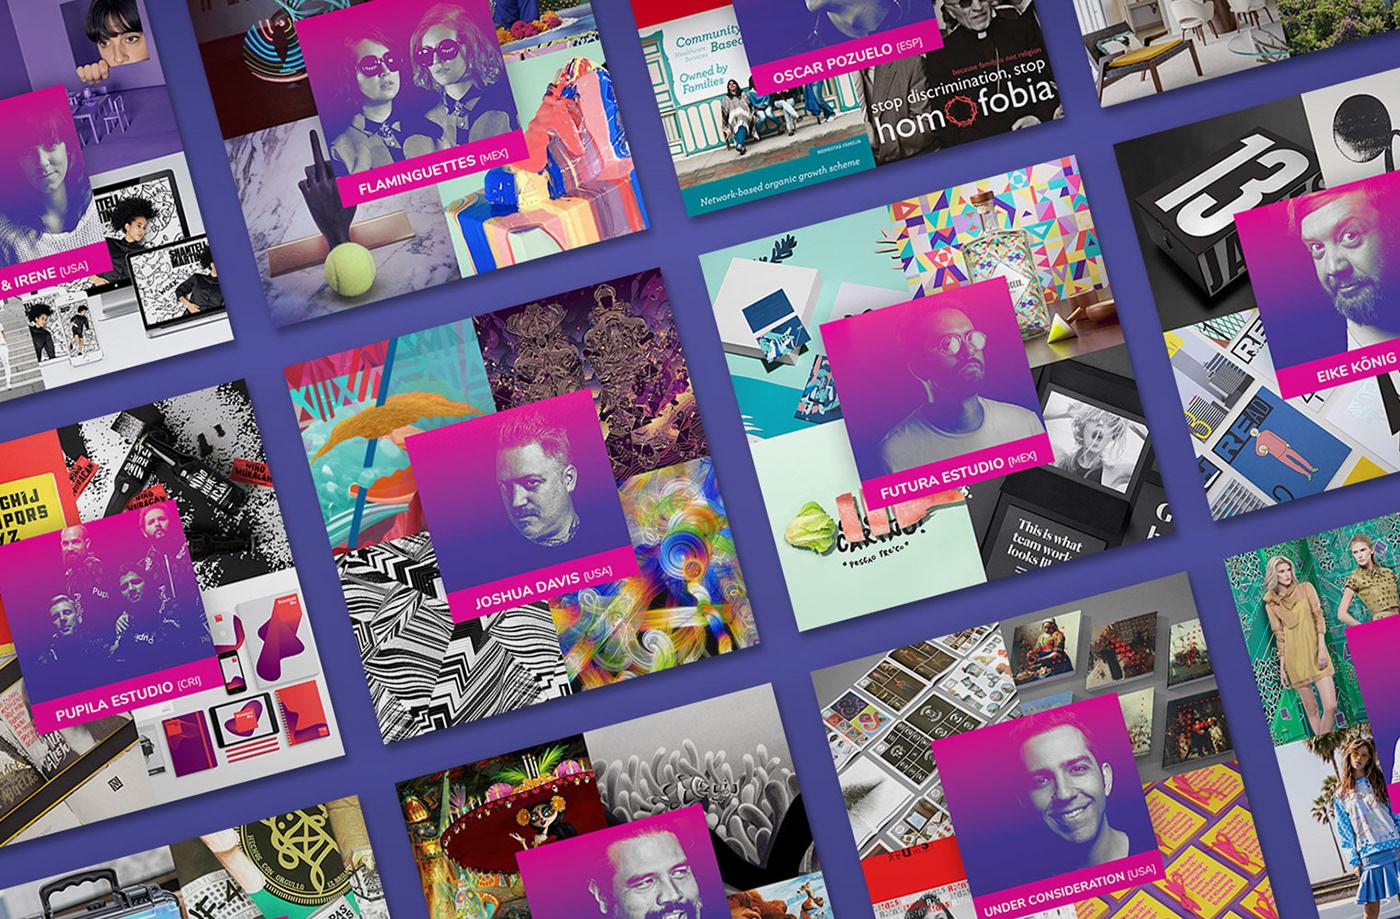 chispafest,Creativity,creative,festival,nicaragua